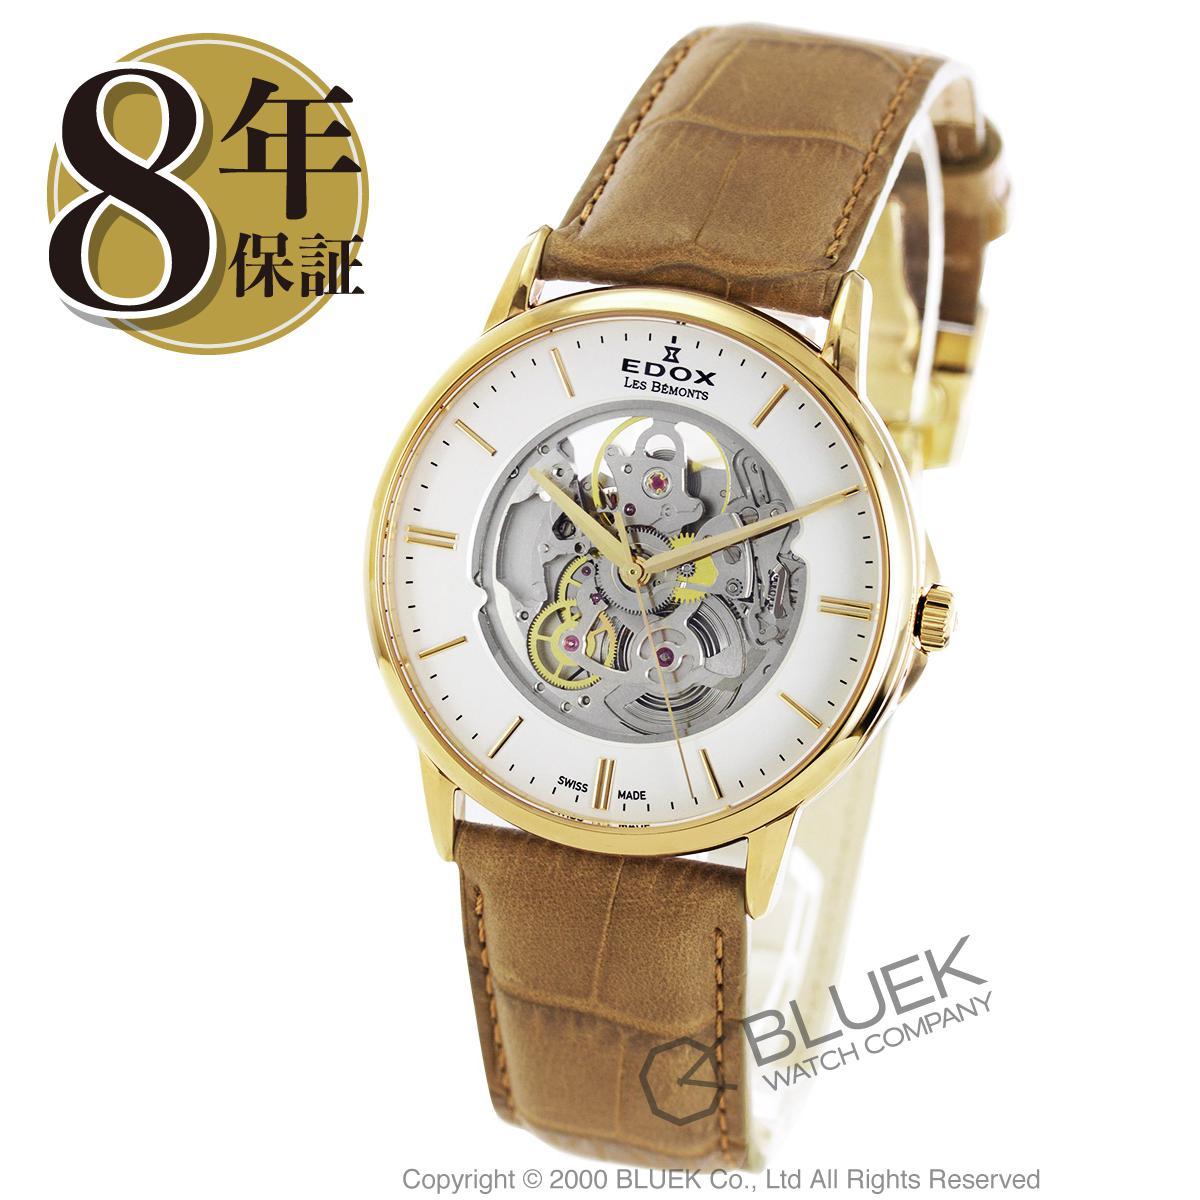 e7cf1fab7e40 エドックスレ・ベモンオープンハート腕時計メンズEDOX85300-37J-AID ...